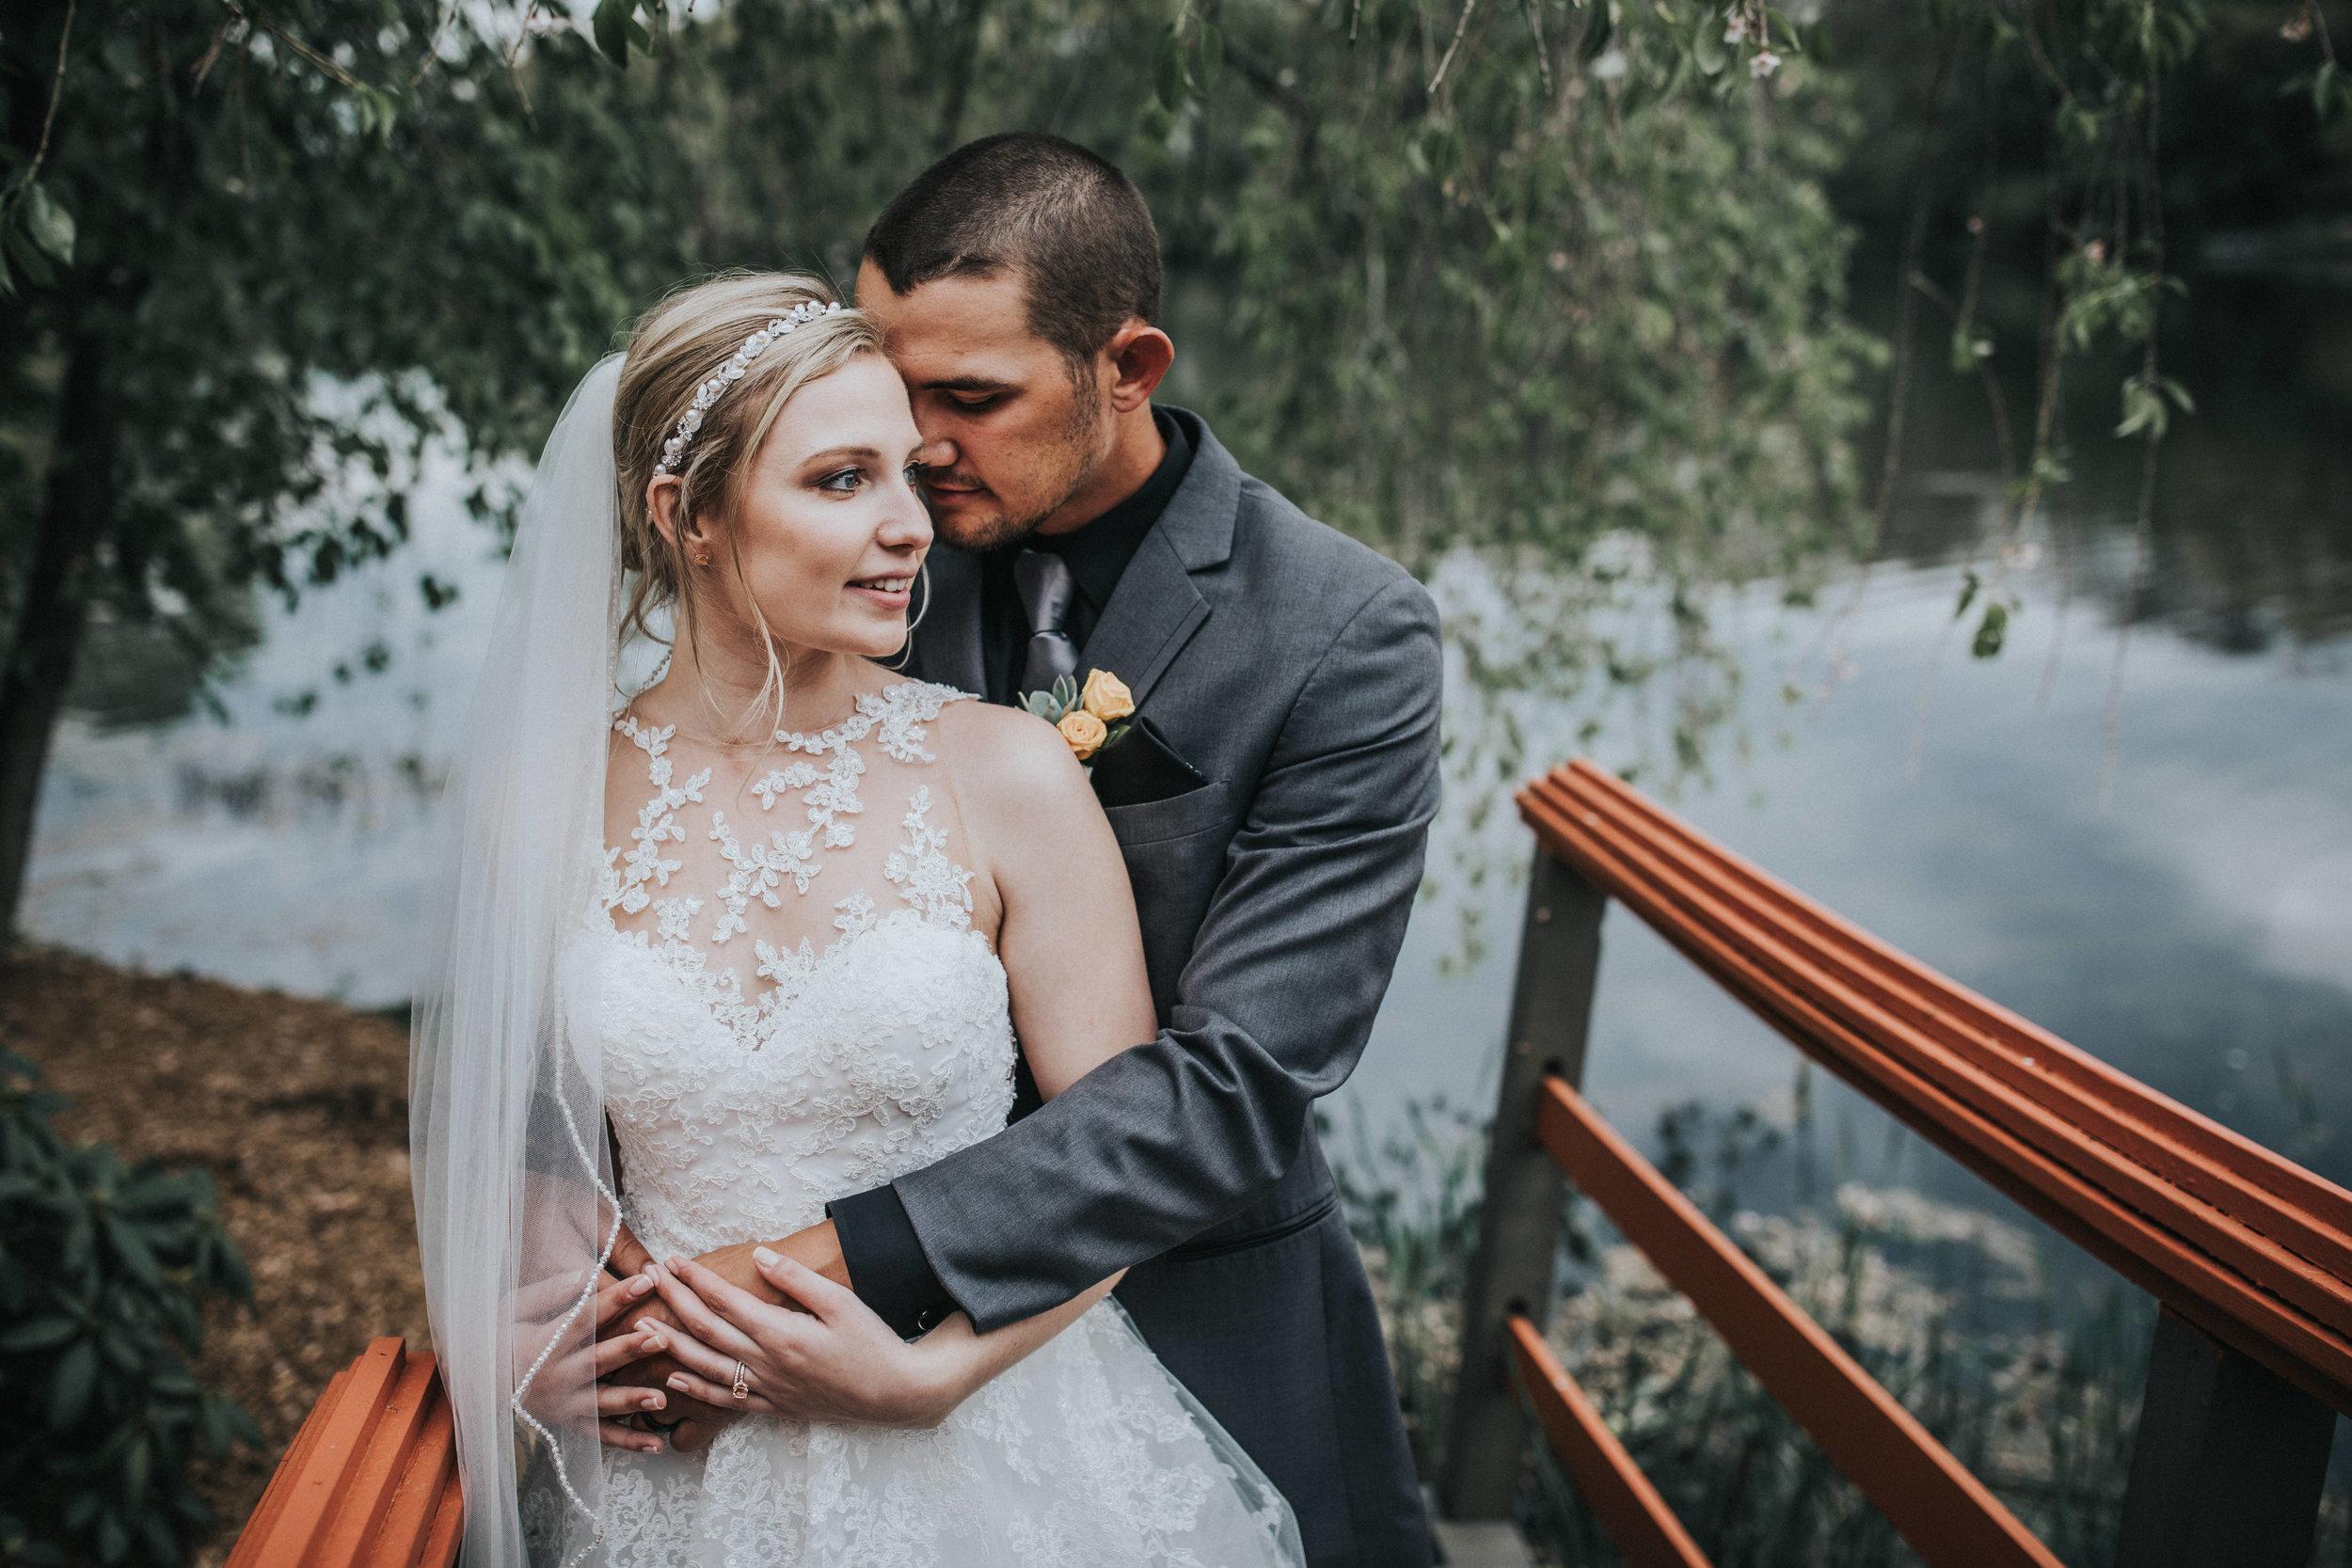 New-Jersey-Wedding-Photographer-Megan&Nick-BrideandGroom-34.jpg